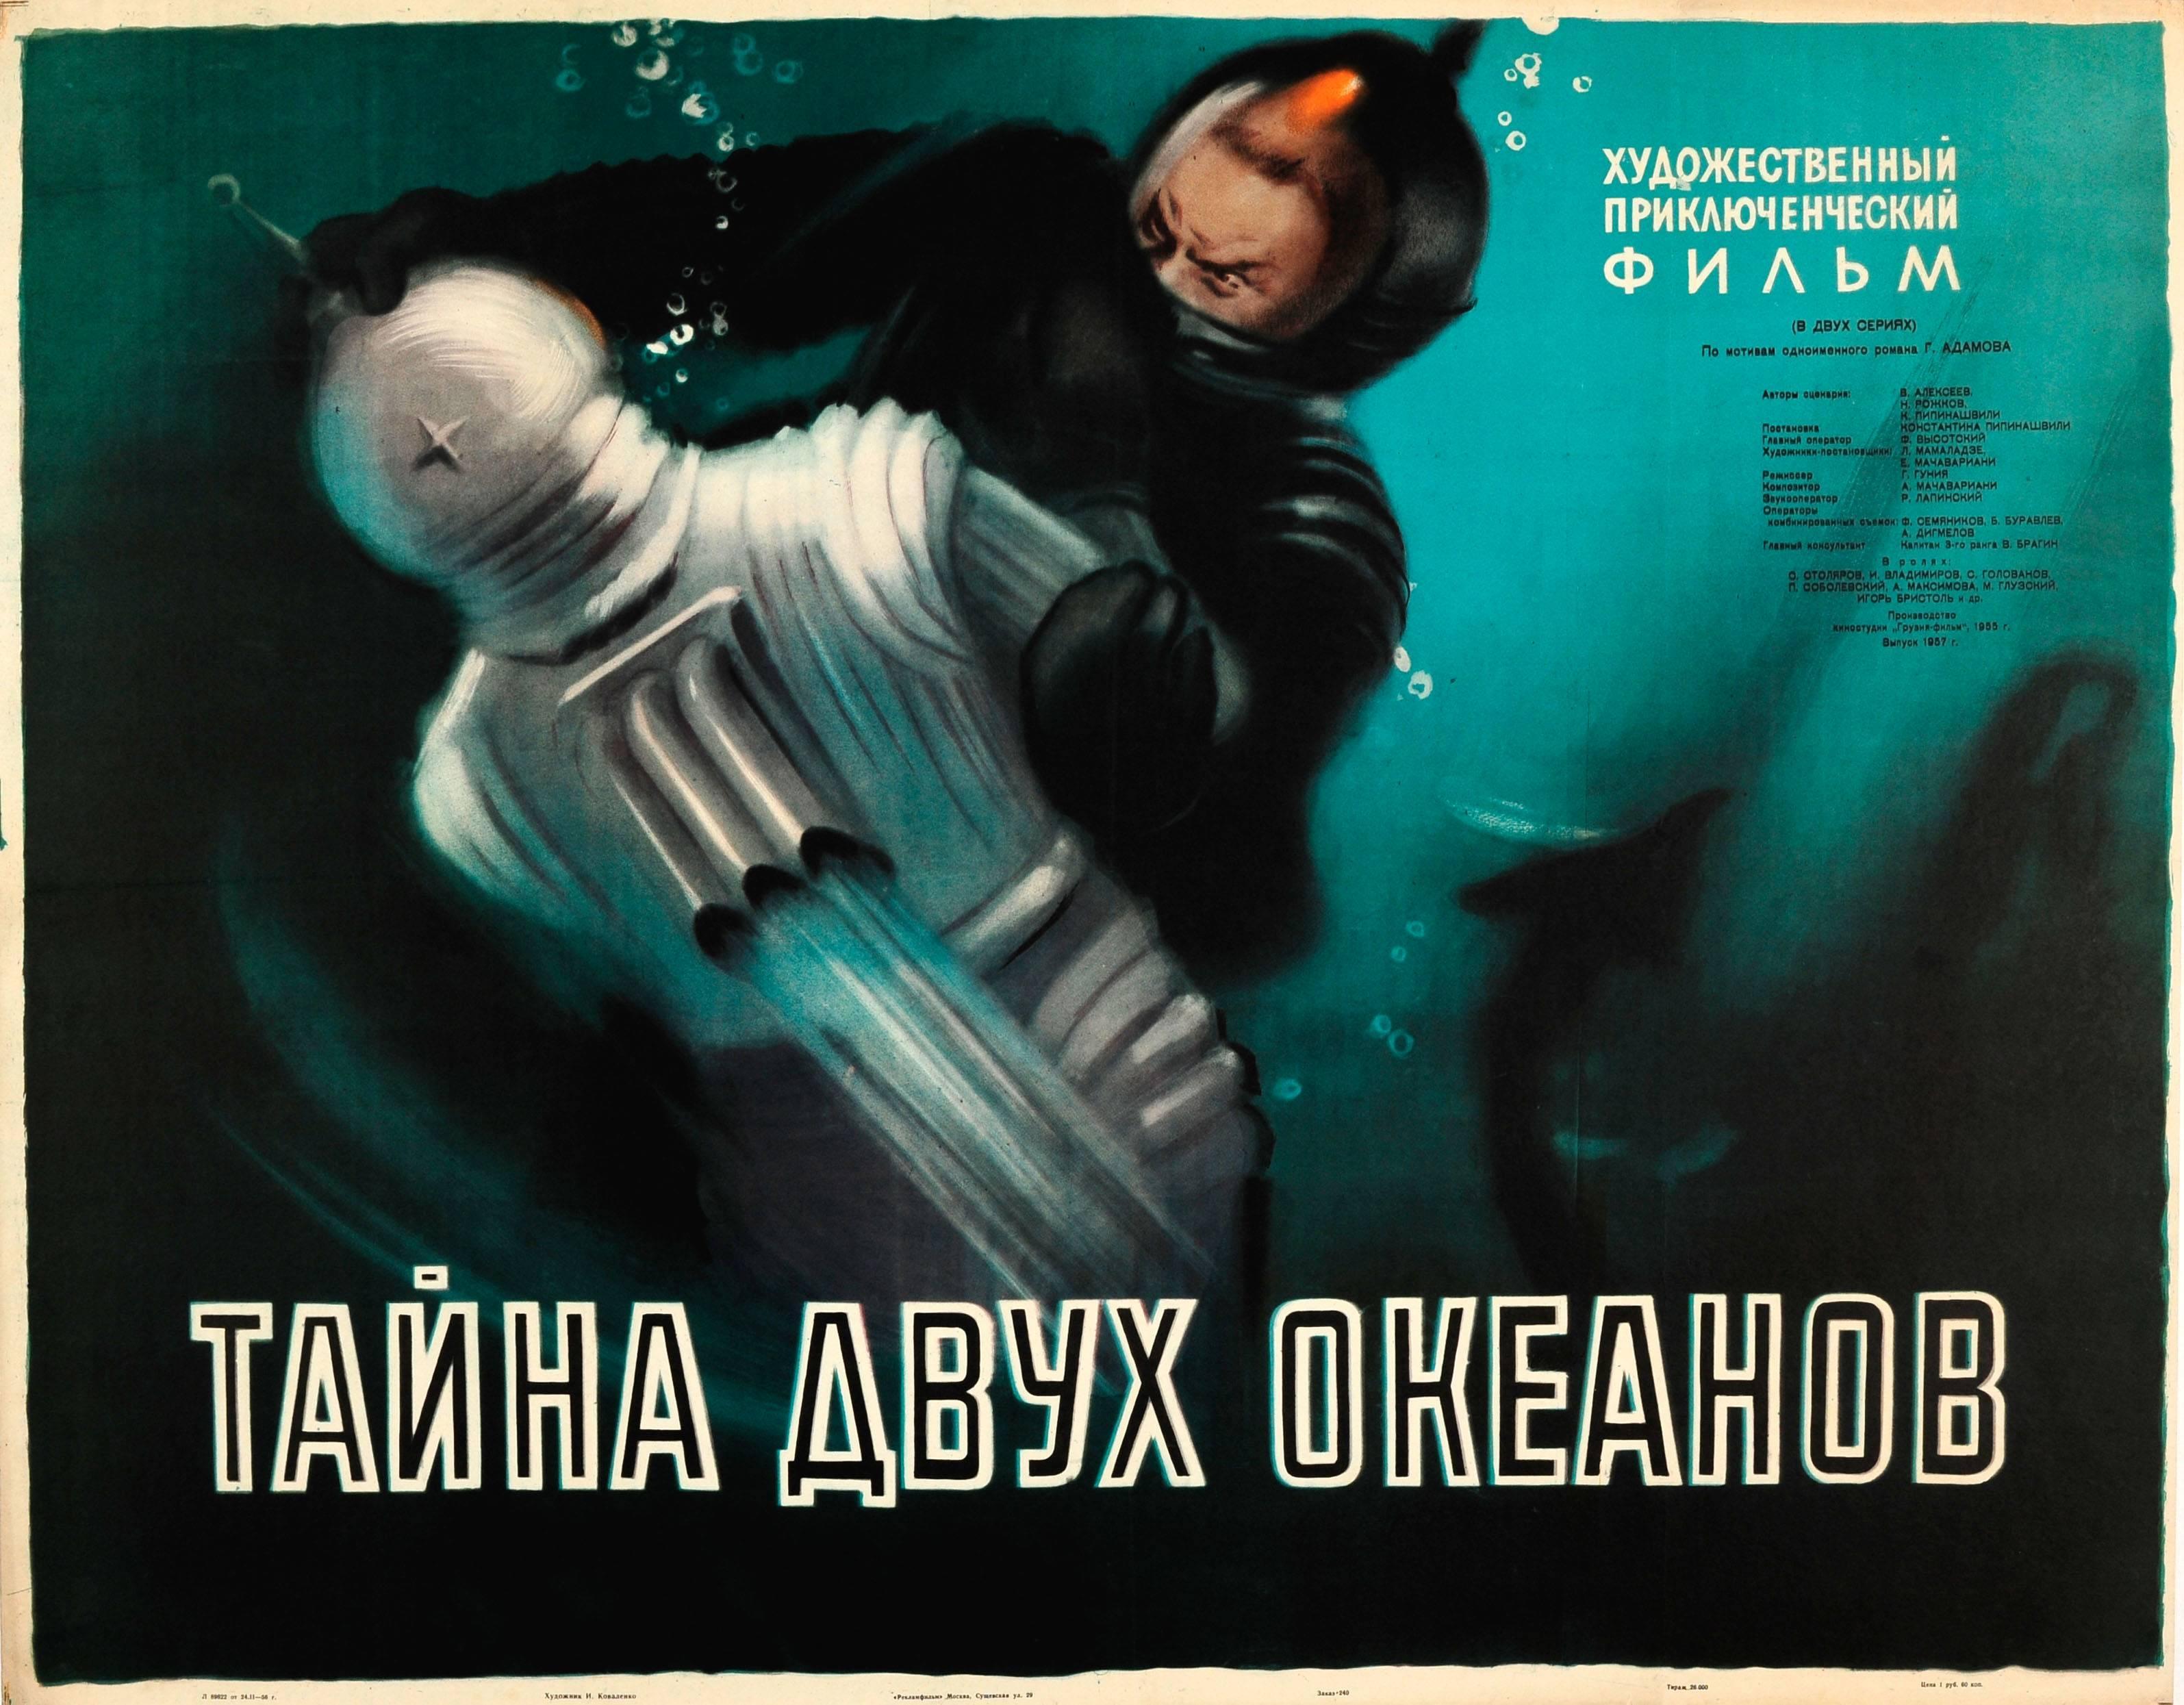 Original Vintage Soviet Science Fiction Movie Poster - The Secret Of Two Oceans